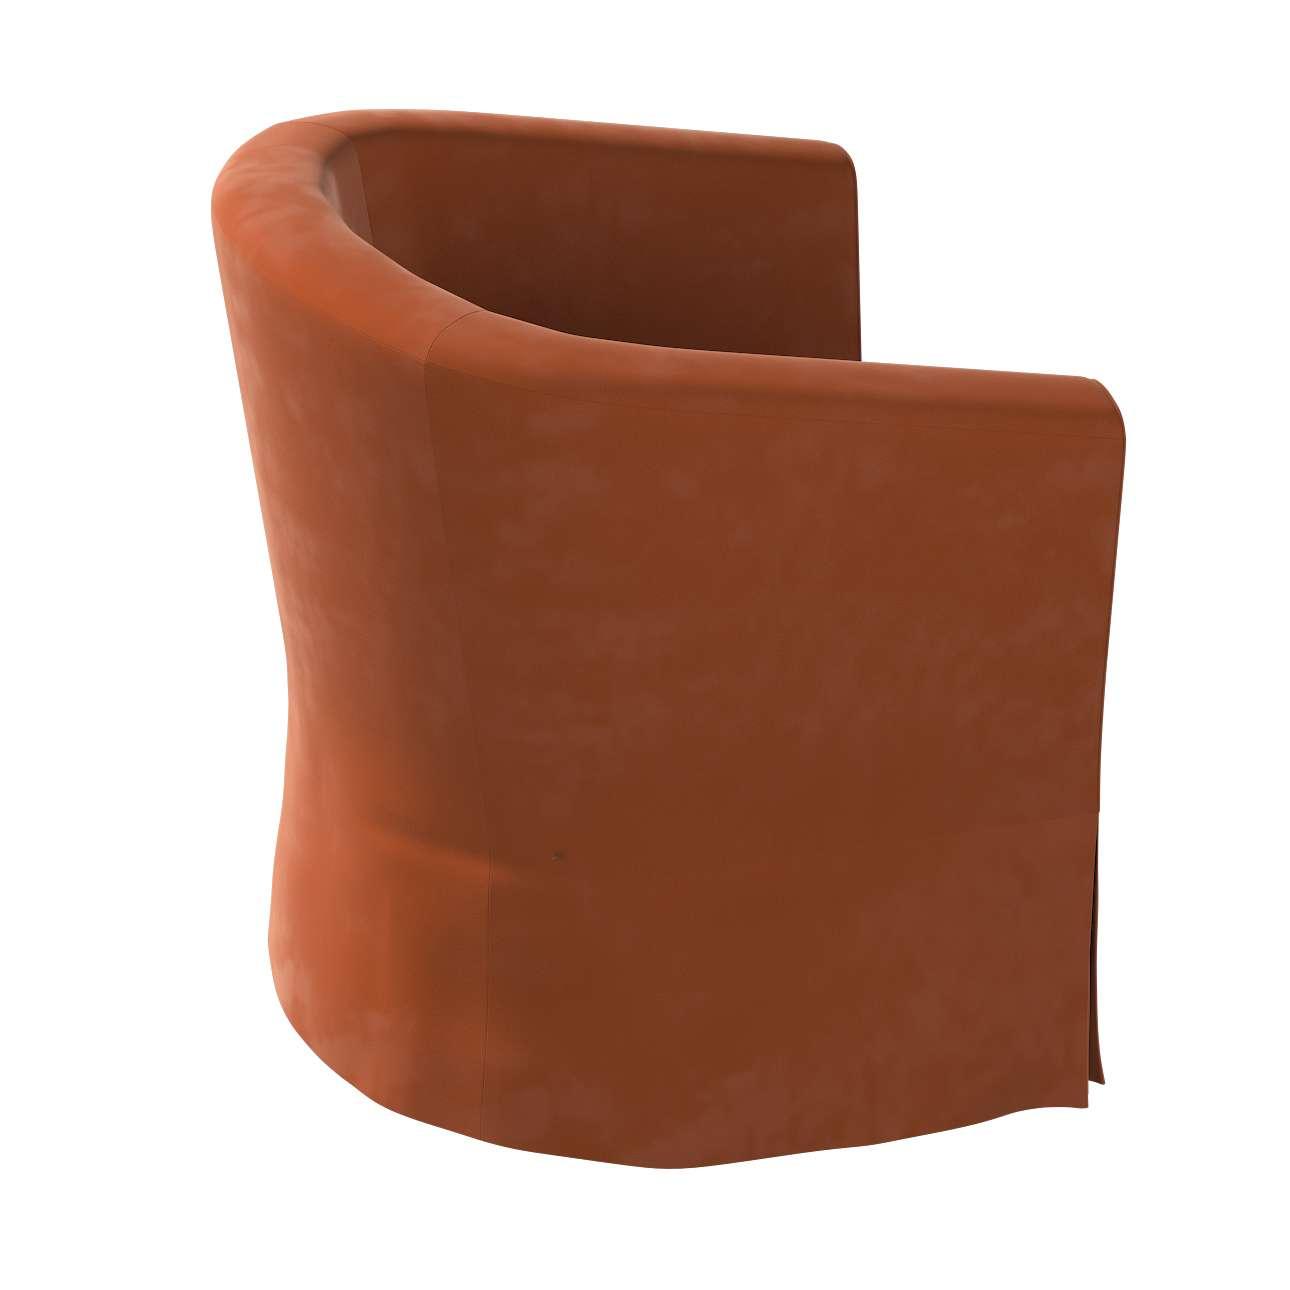 Pokrowiec na fotel Ektorp Tullsta w kolekcji Velvet, tkanina: 704-33